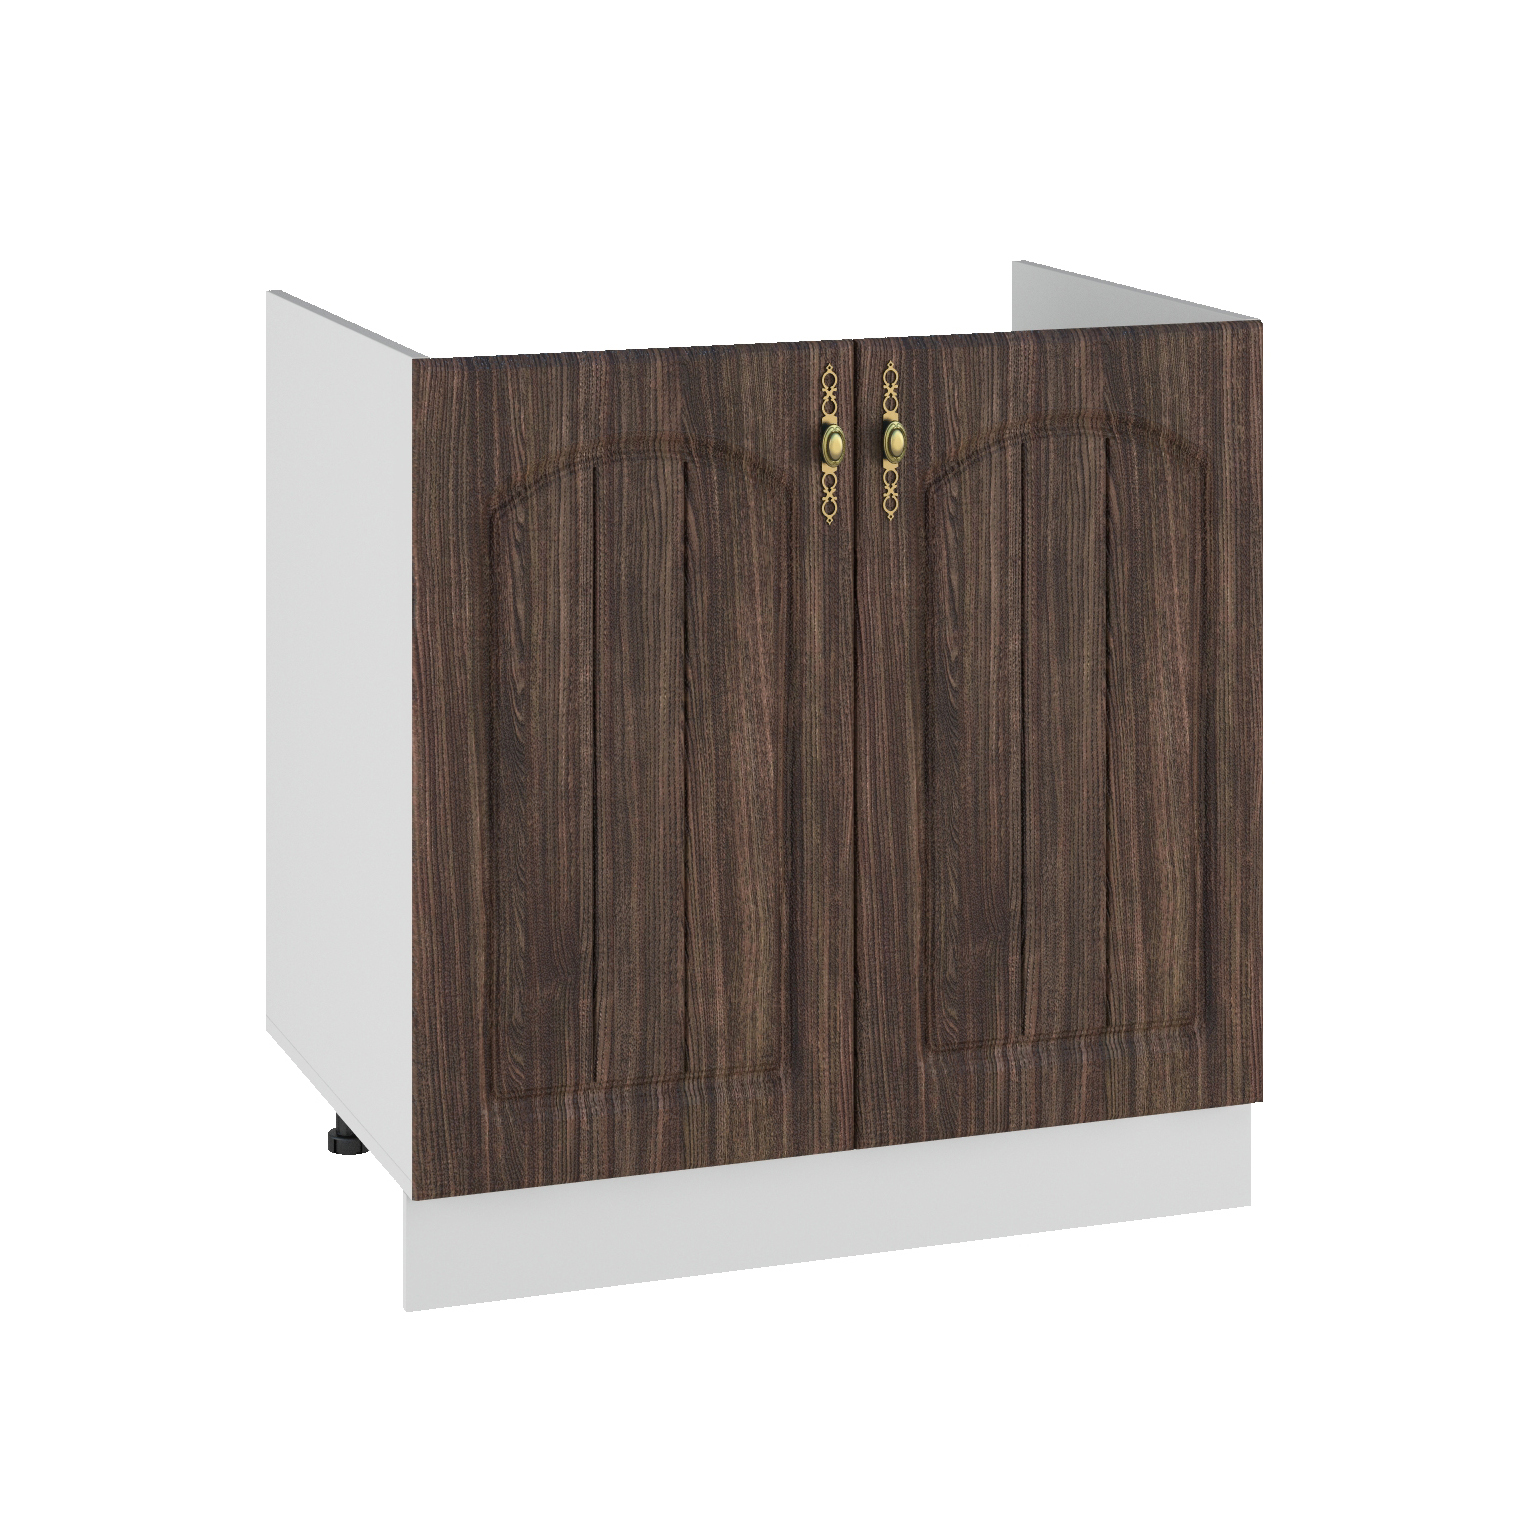 Кухня Монако СМ 800 Шкаф нижний мойка